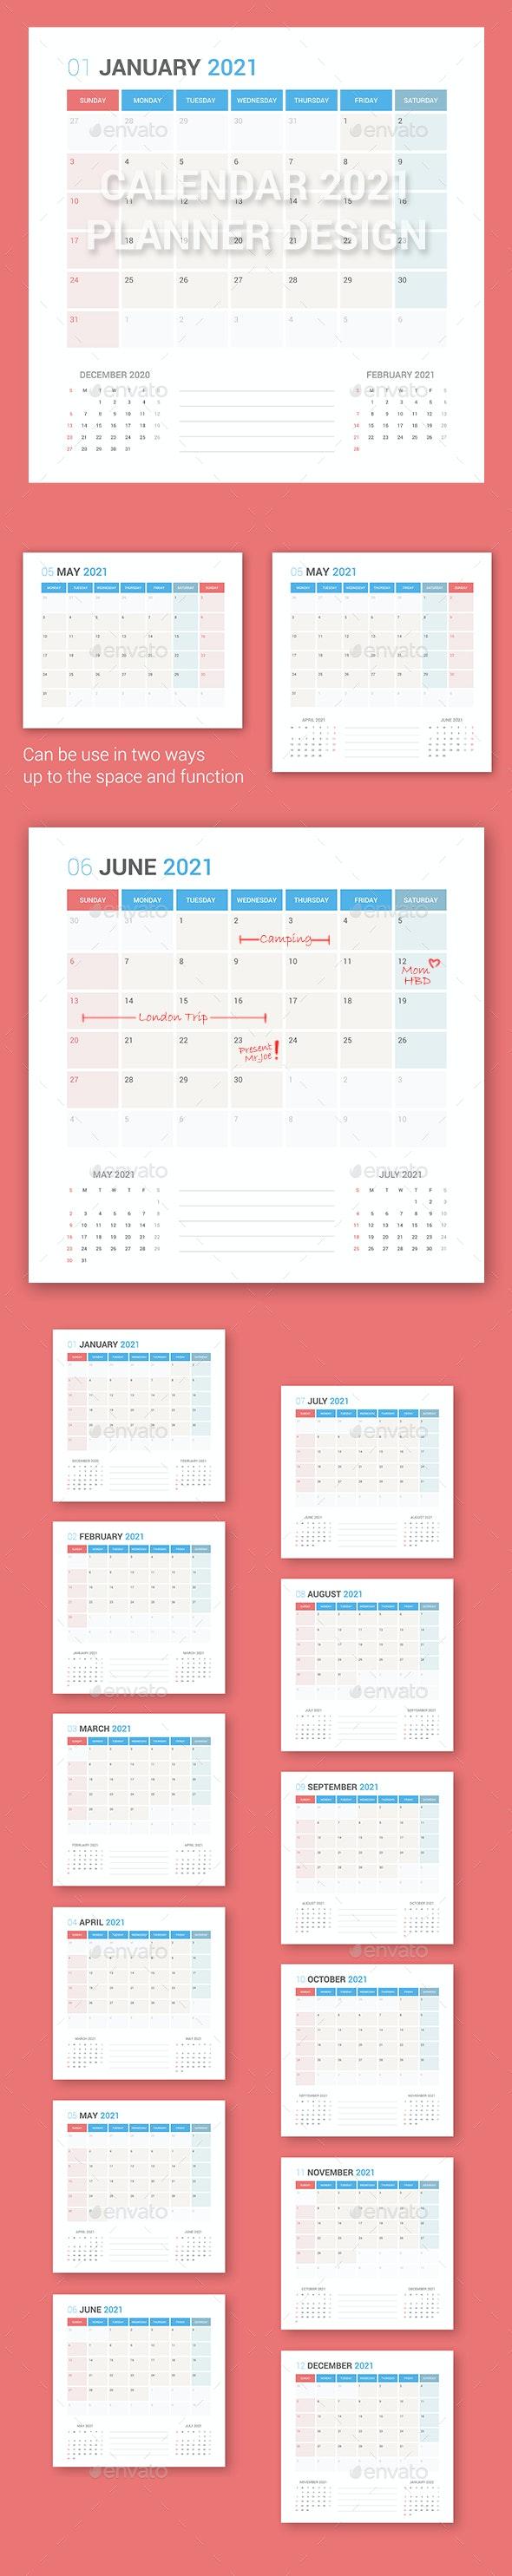 Calendar 2021 Planner Design - Miscellaneous Characters